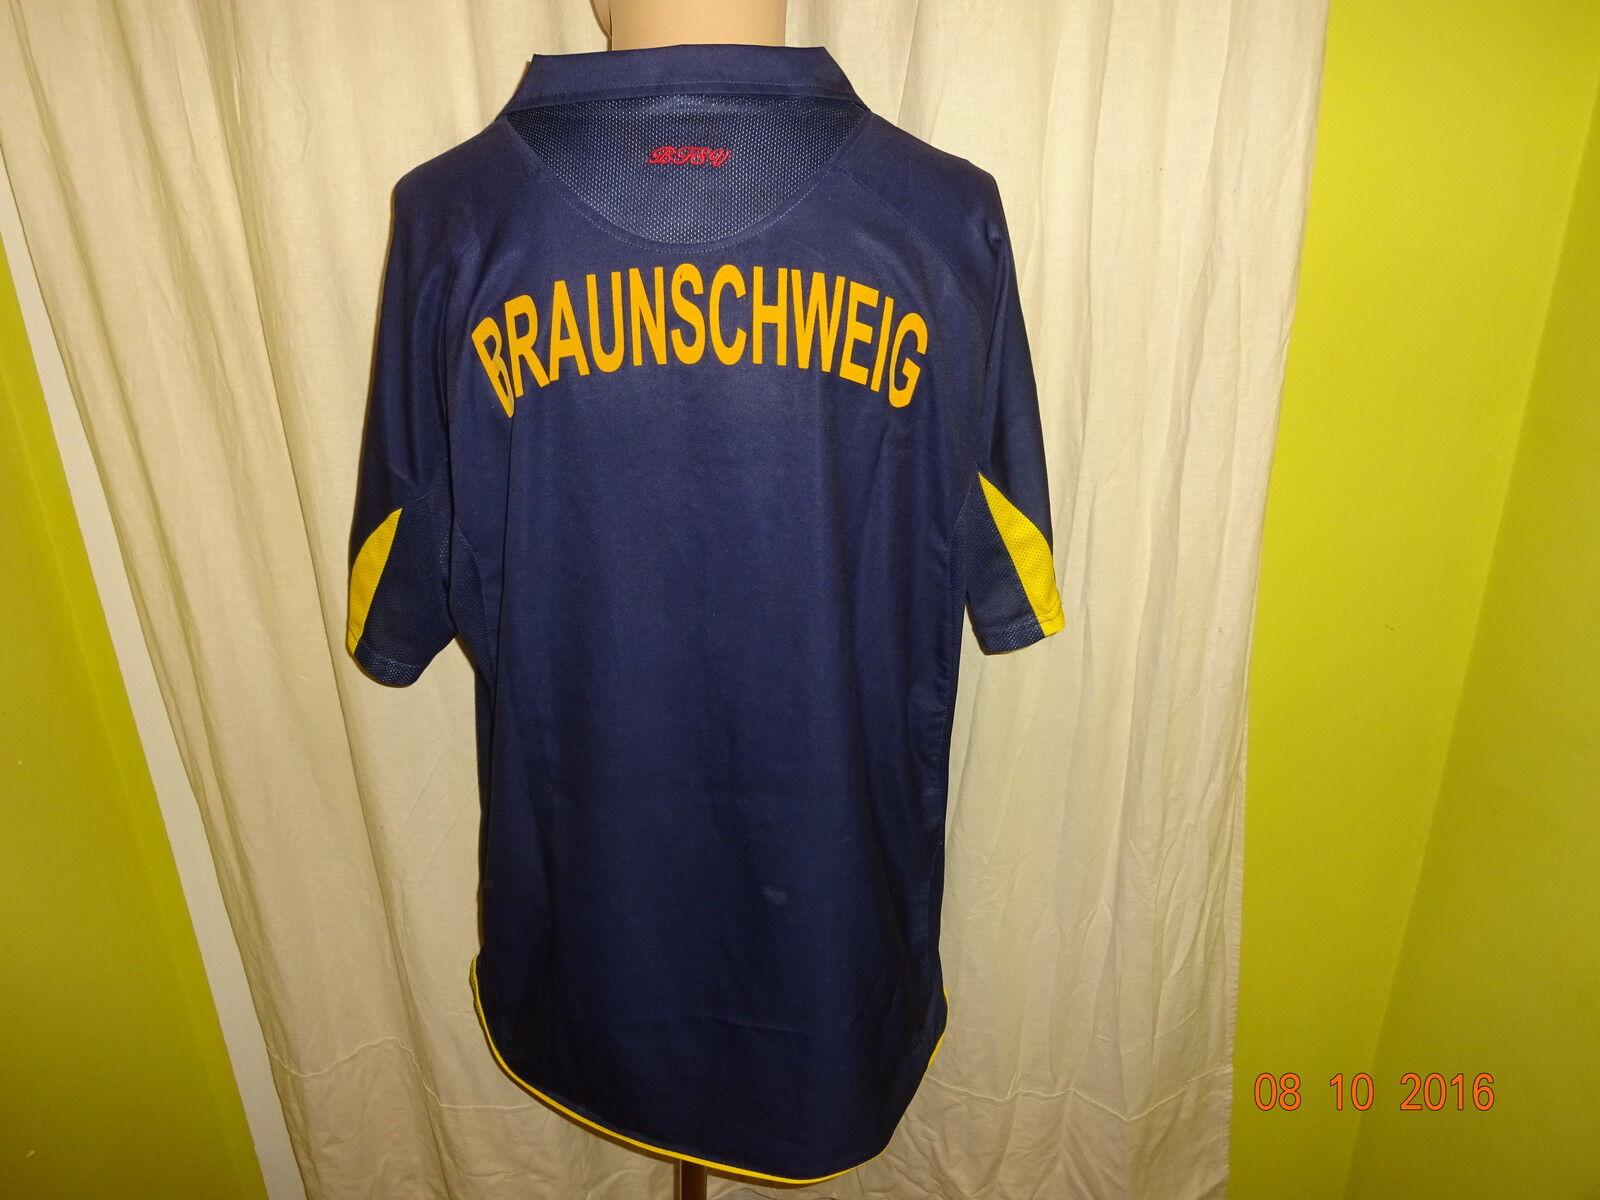 Eintracht Braunschweig Jako Auswärts Trikot 2006 07 07 07  BS Energy  Gr.XXL TOP  | Flagship-Store  2c3bb2